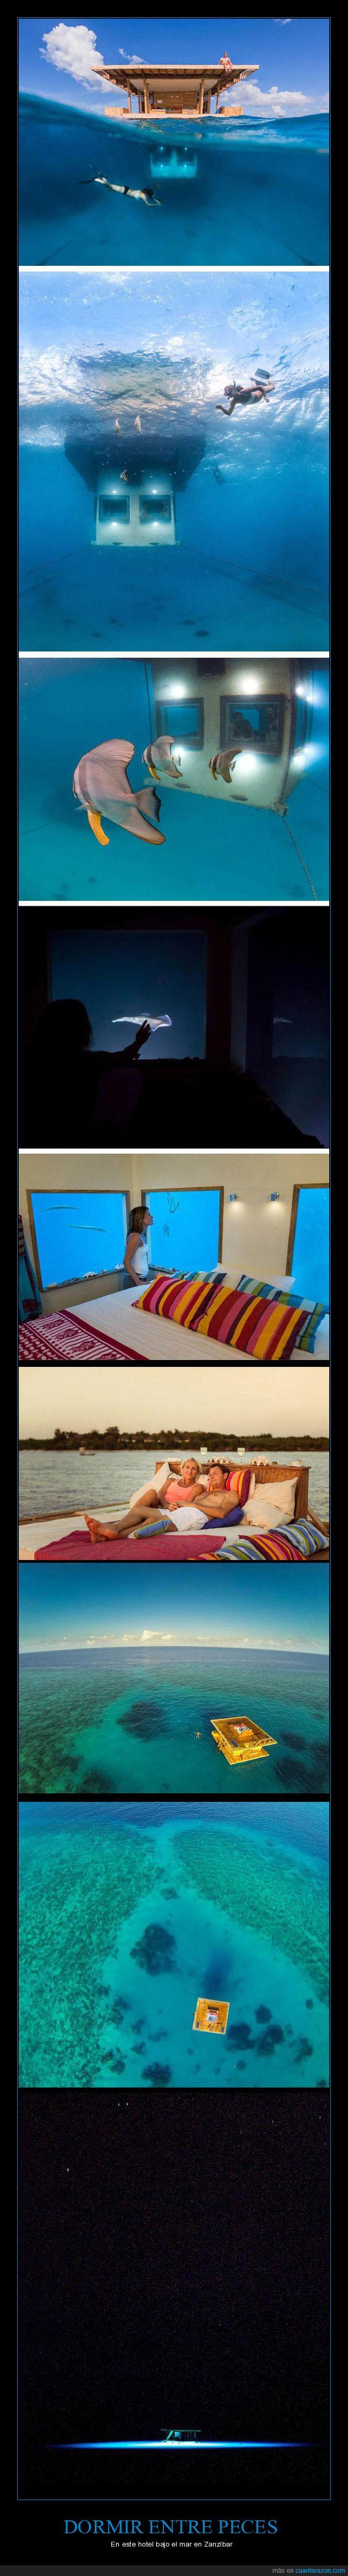 hotel,mar,peces